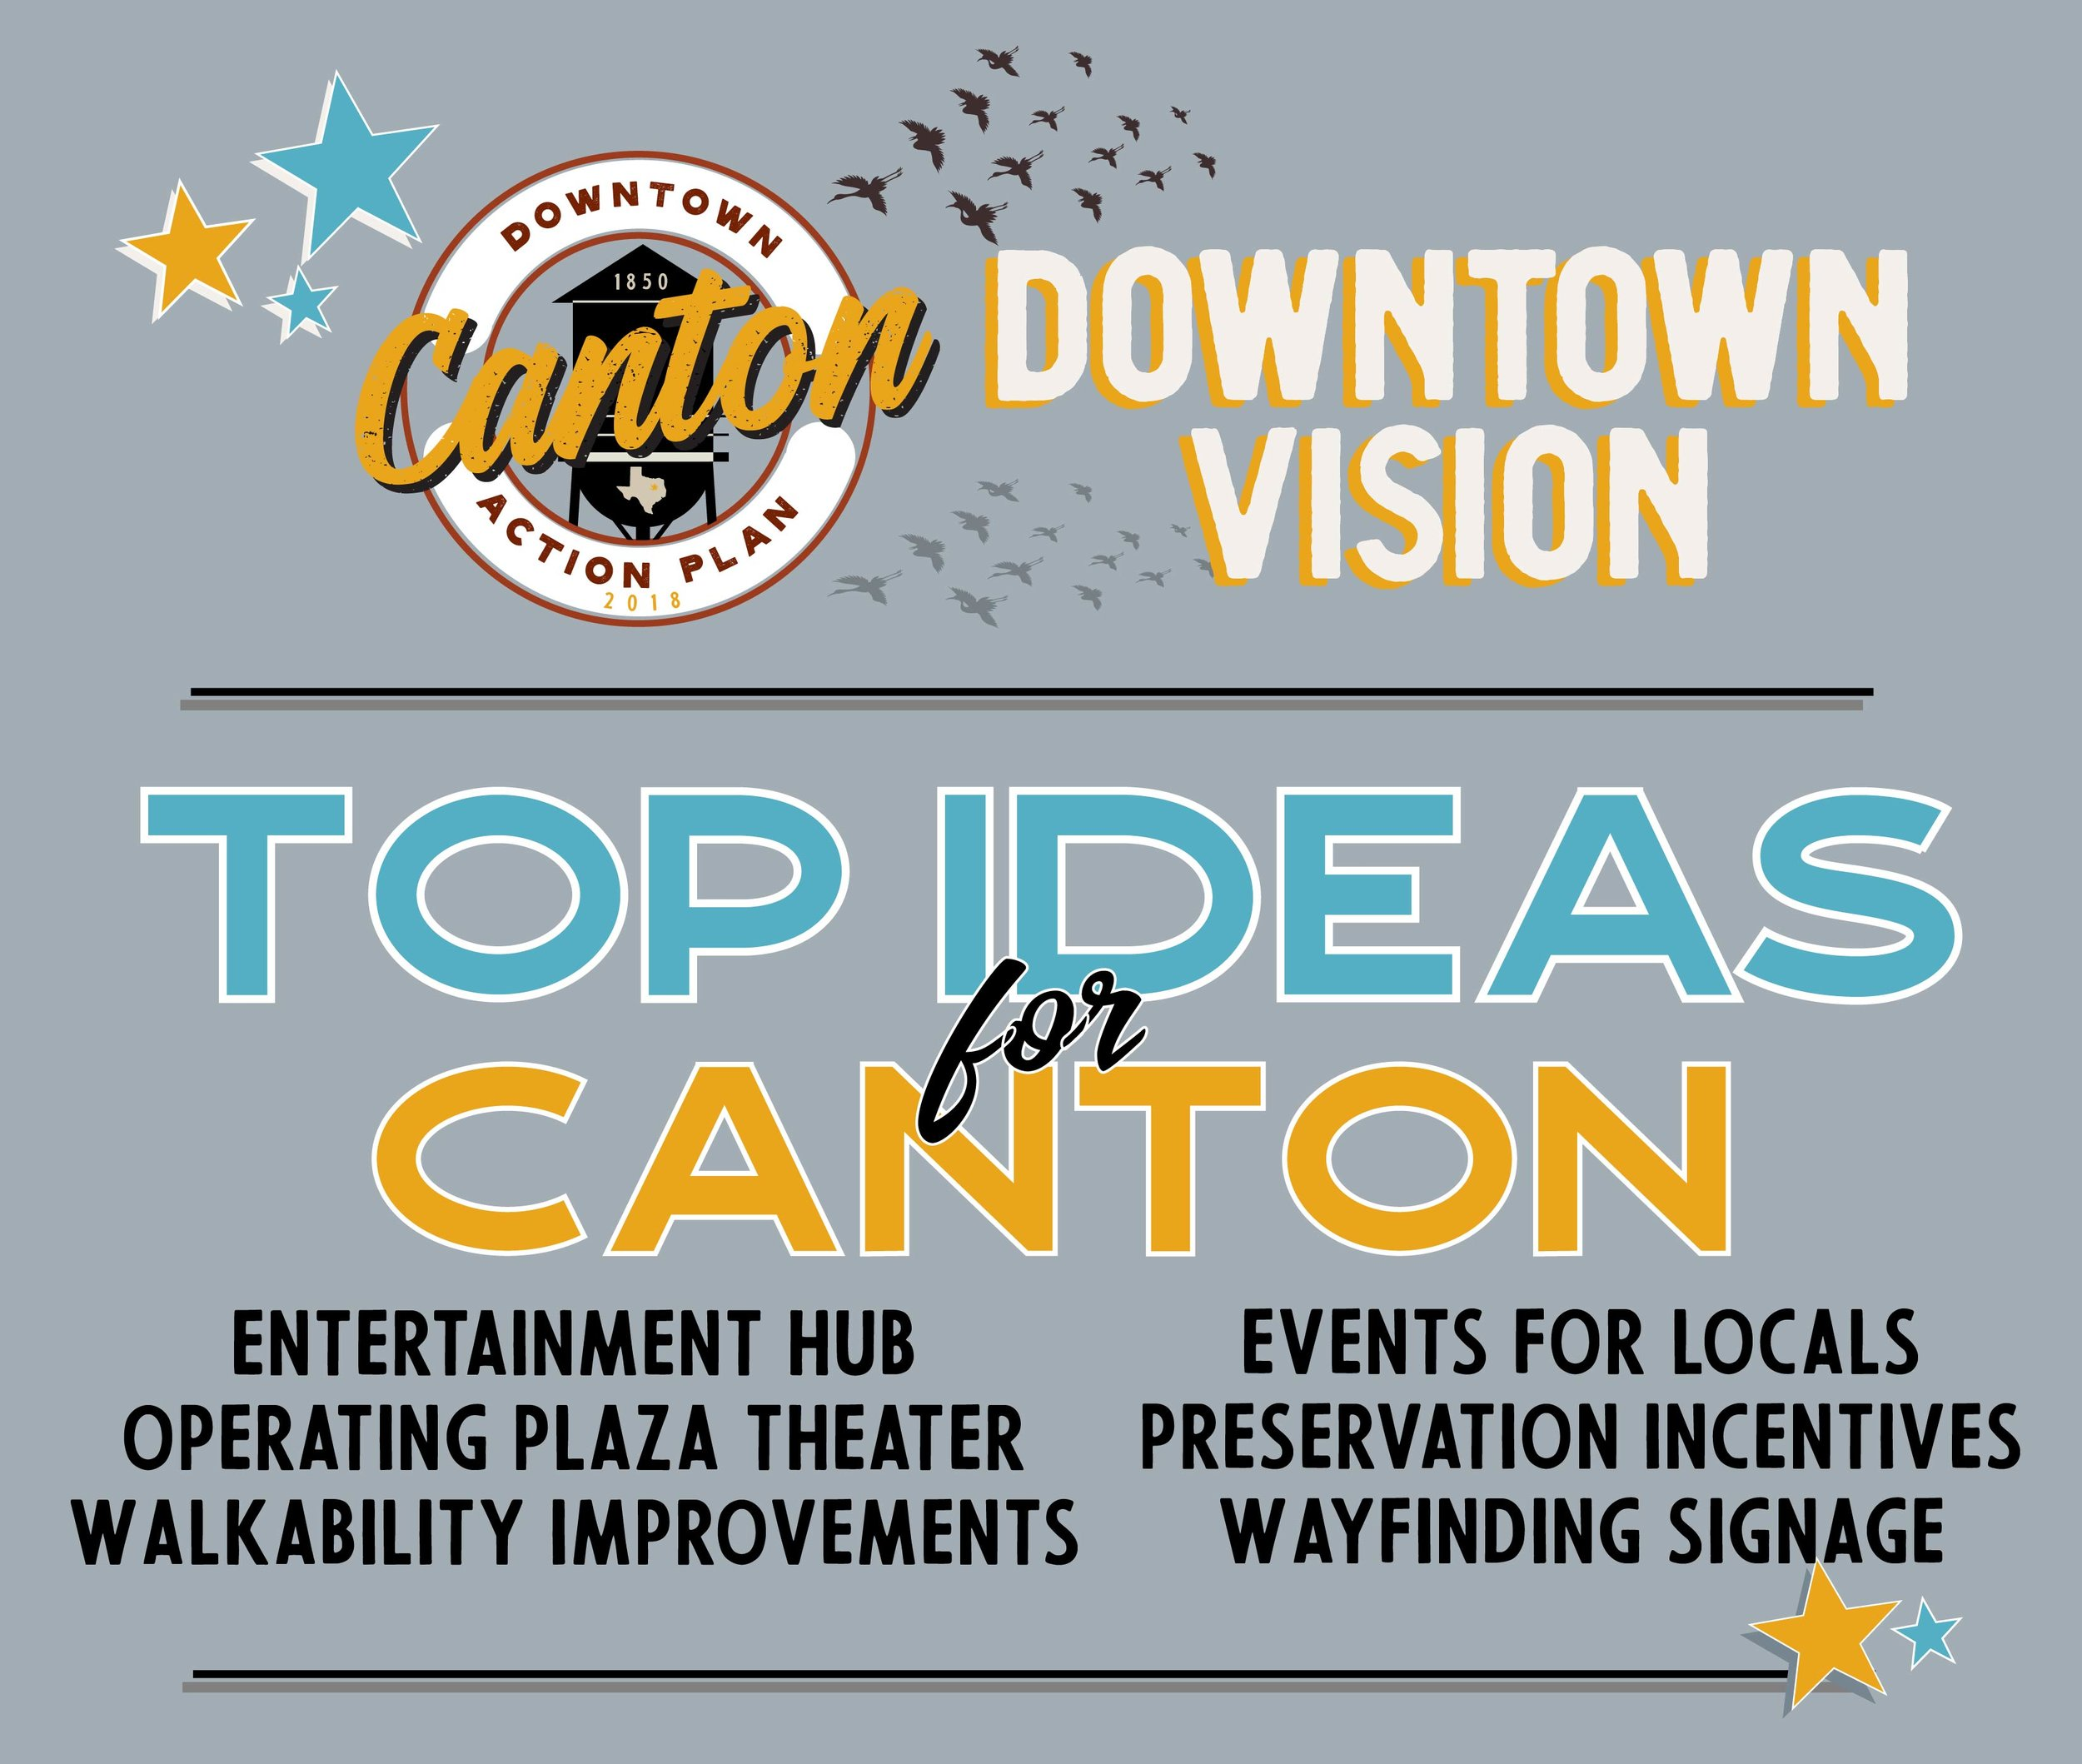 2018-08-17 Top Ideas for Canton-01.jpg